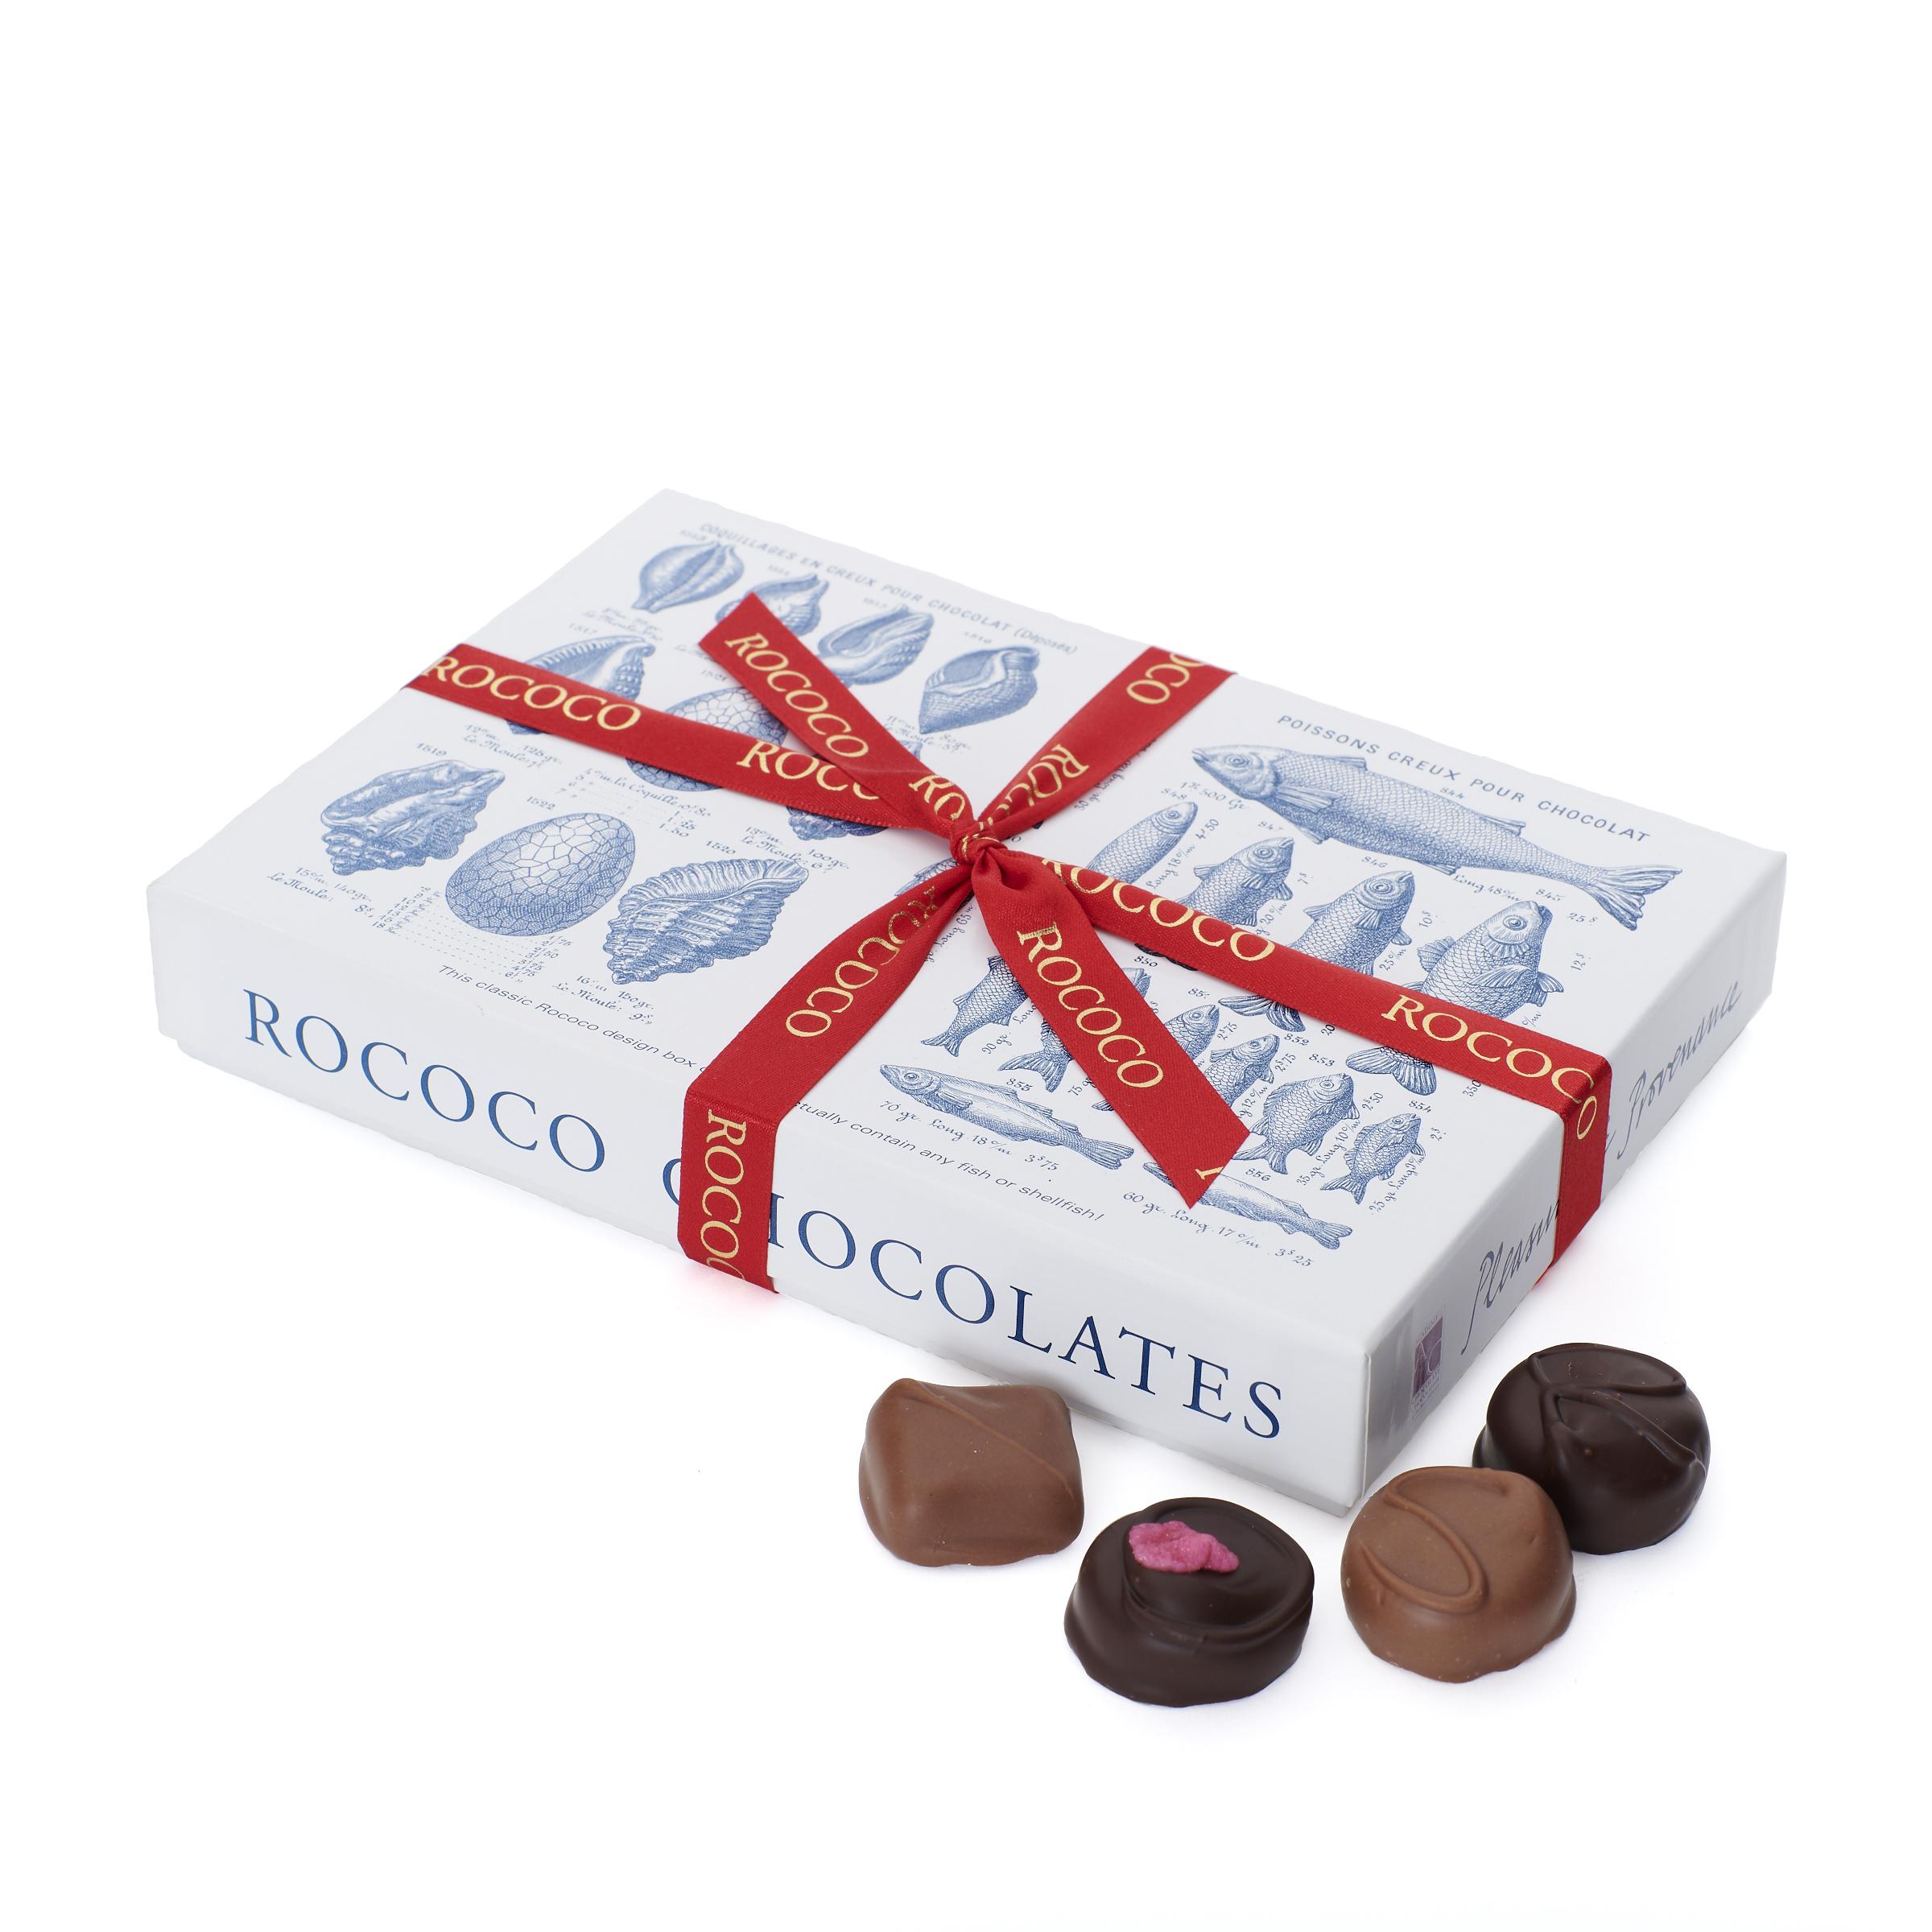 Image of Rococo Chocolates – English Selection Creams & Caramels